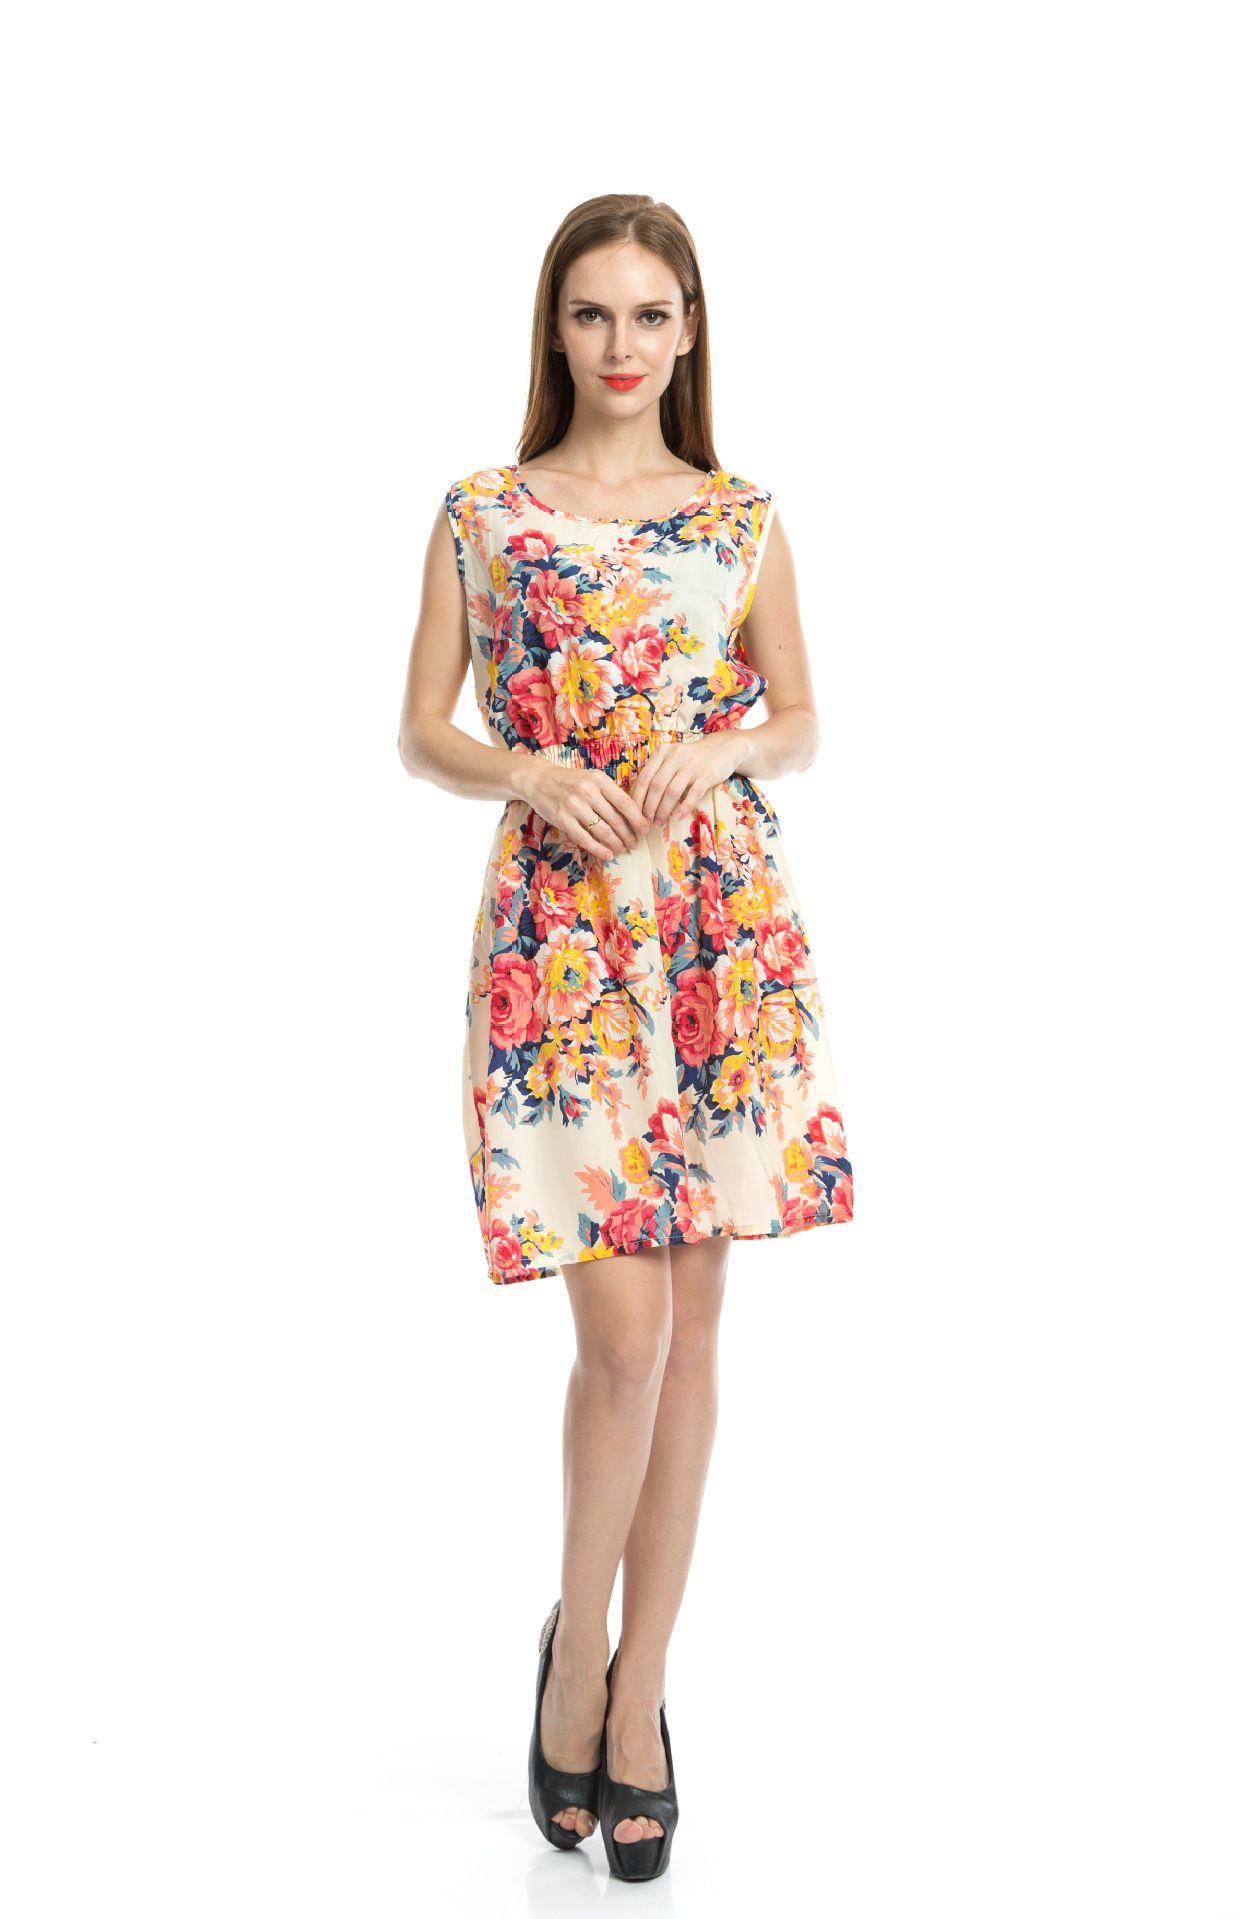 1963dbf8d3 Newest fashion Women Casual Dress Plus Size Cheap China Dress Designs Women  Clothing Fashion Sleeveless Summe Dress Free Shipping